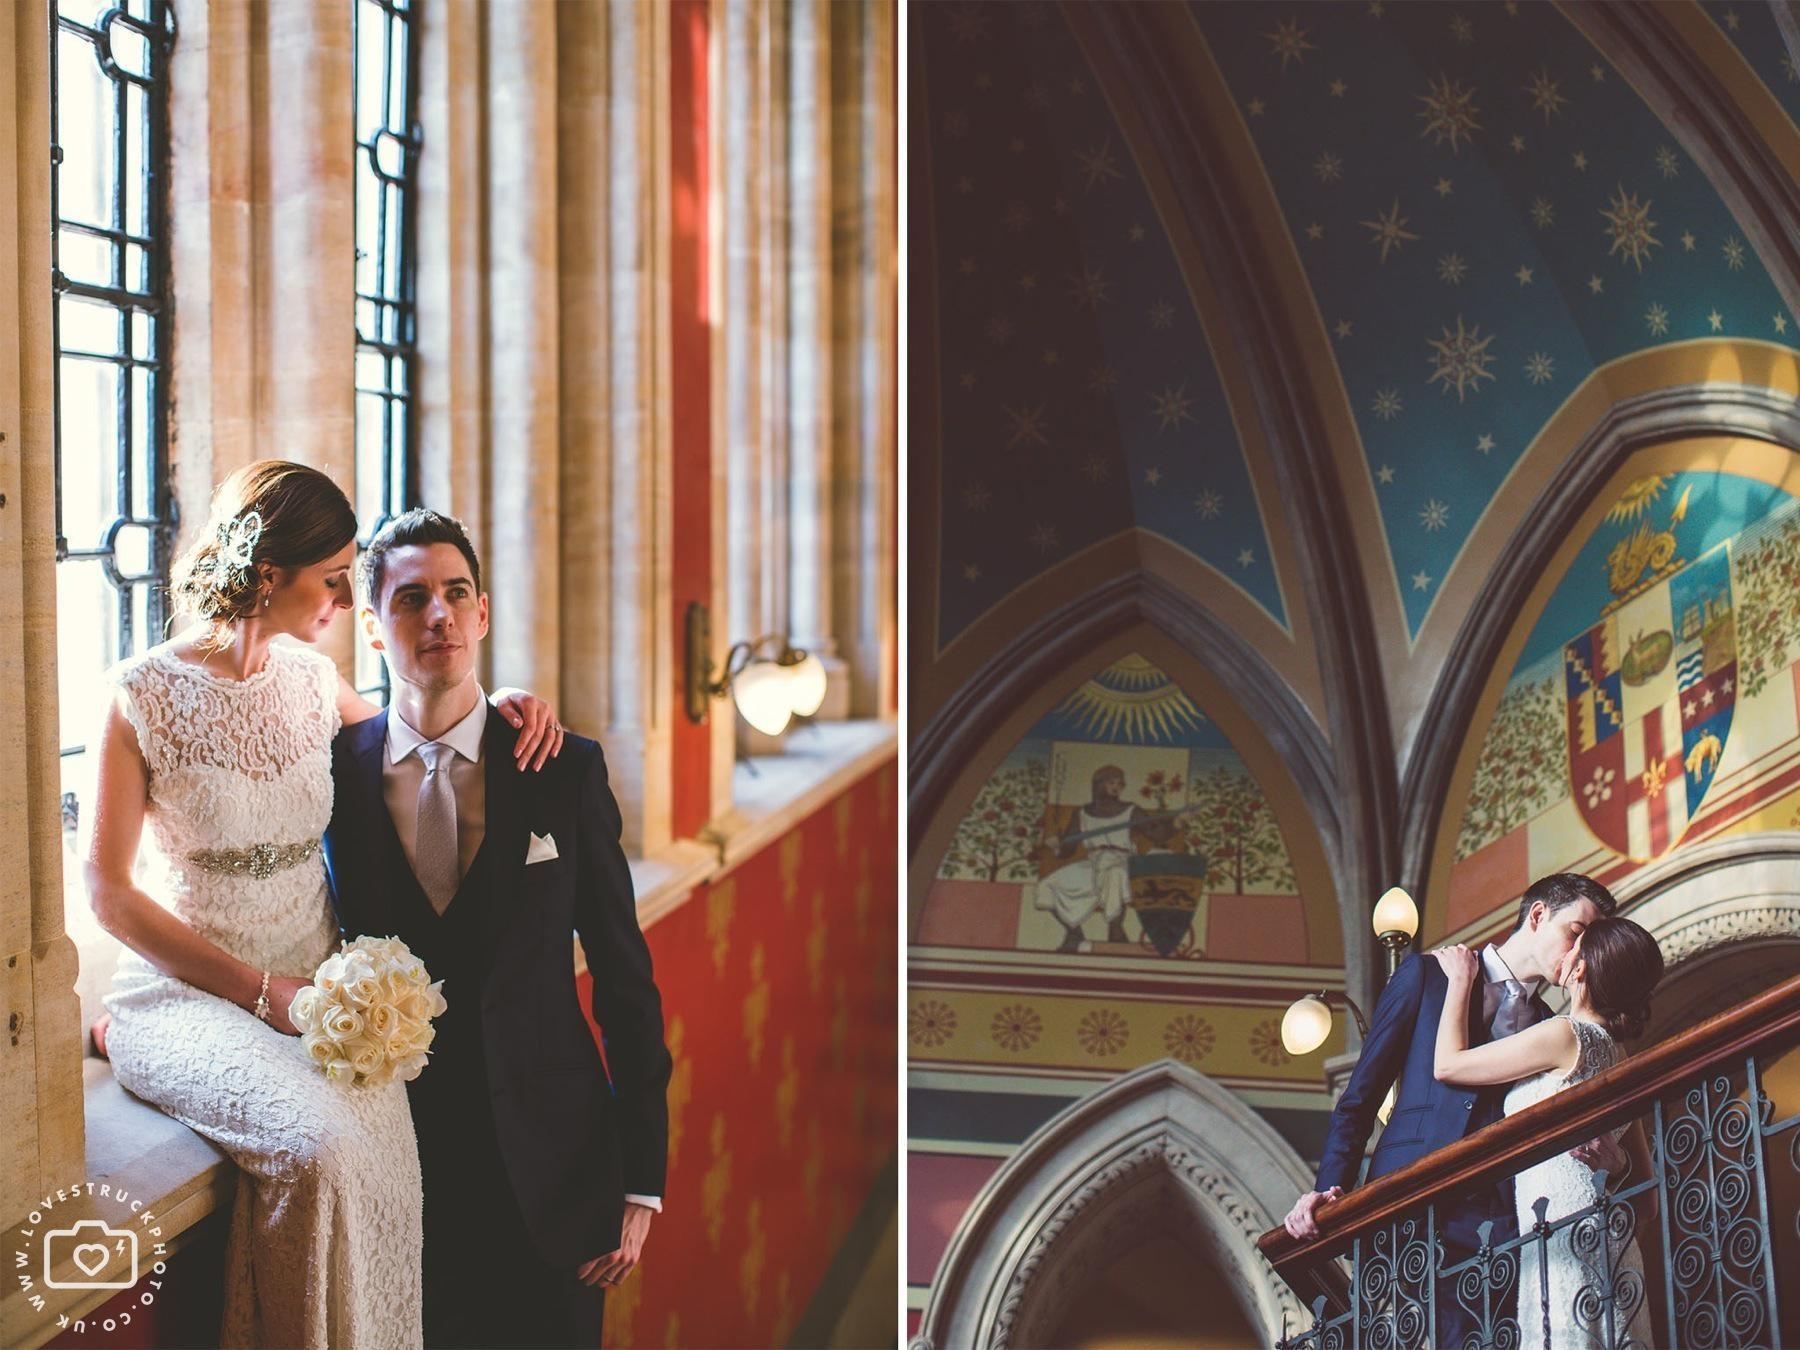 London St Pancras Renaissance Hotel Wedding, Renaissance Chambers Wedding